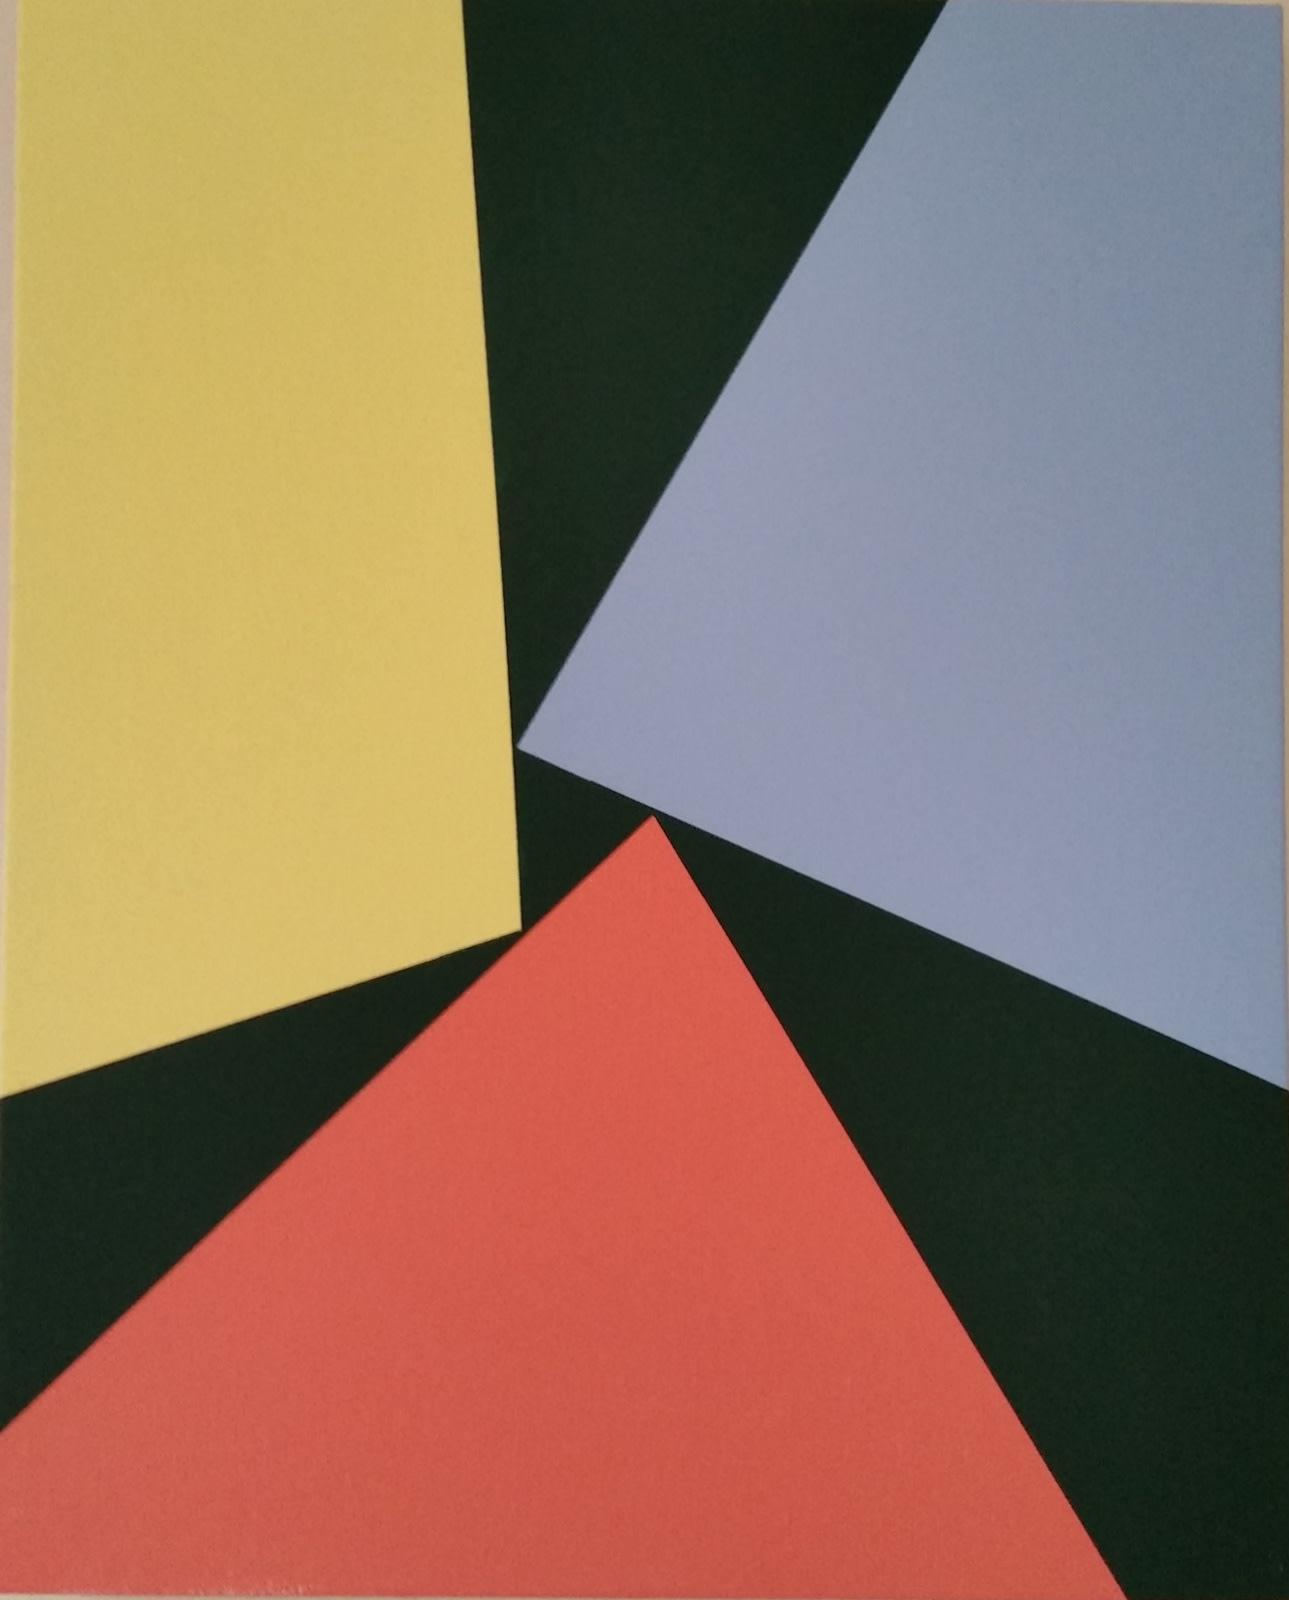 Bruno ROUSSELOT, A. n°69, 2014